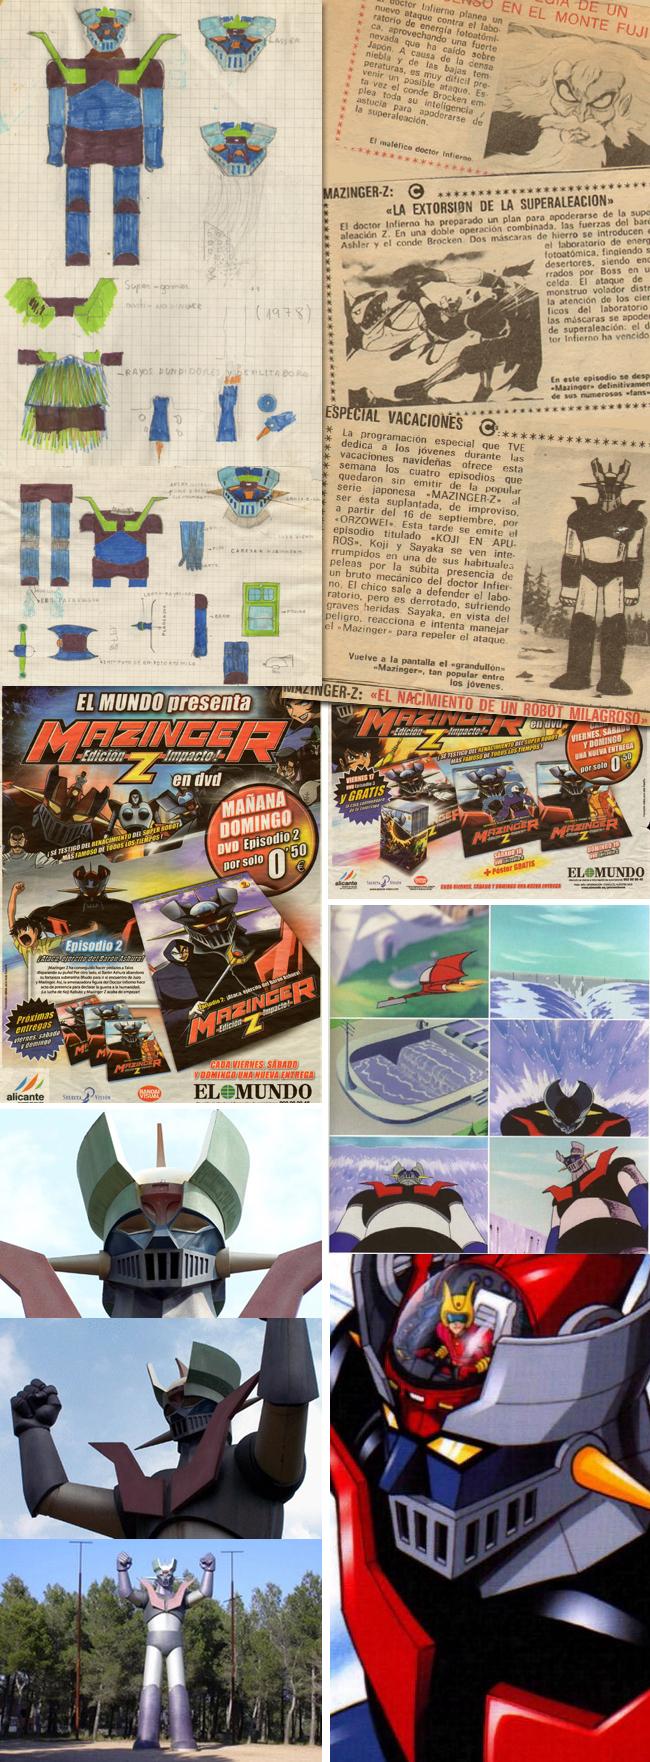 Mazinger-z-1-academia-c10-madrid-comic-cursos-carlos diez-aerografia-ilustracion